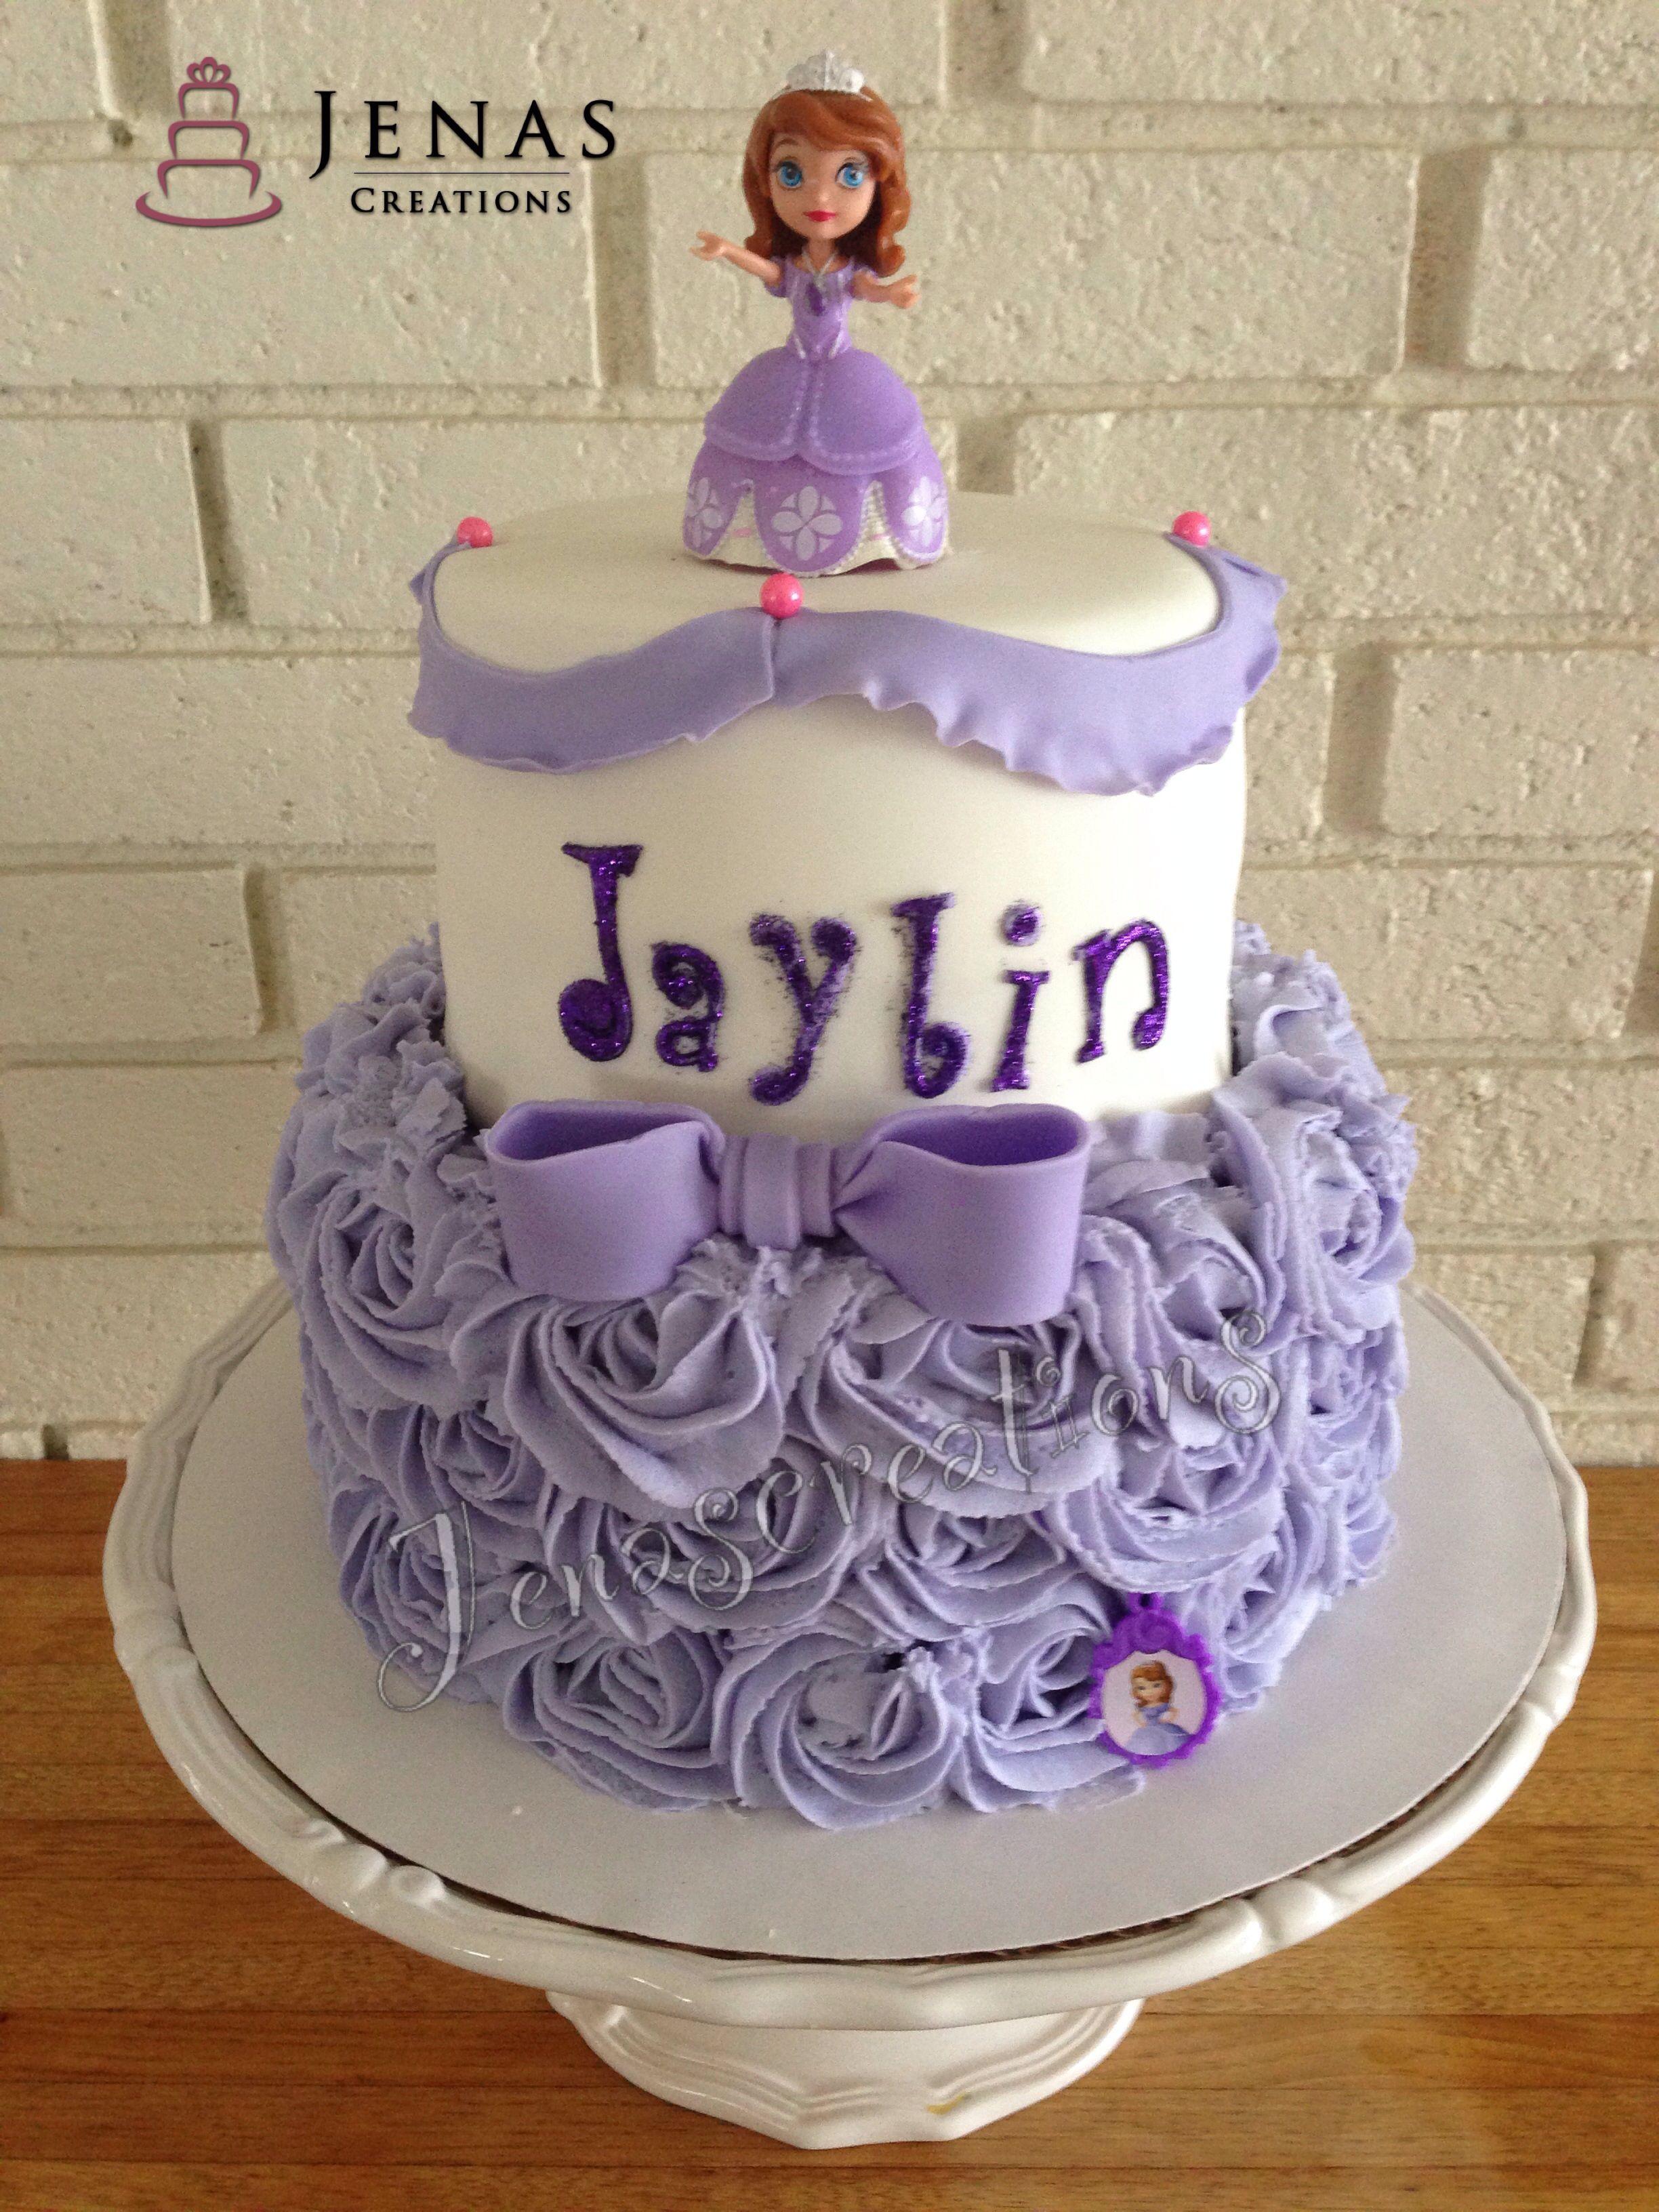 Astonishing Sofia The First Theme Cake Birthday Cake Sofia The First With Personalised Birthday Cards Arneslily Jamesorg